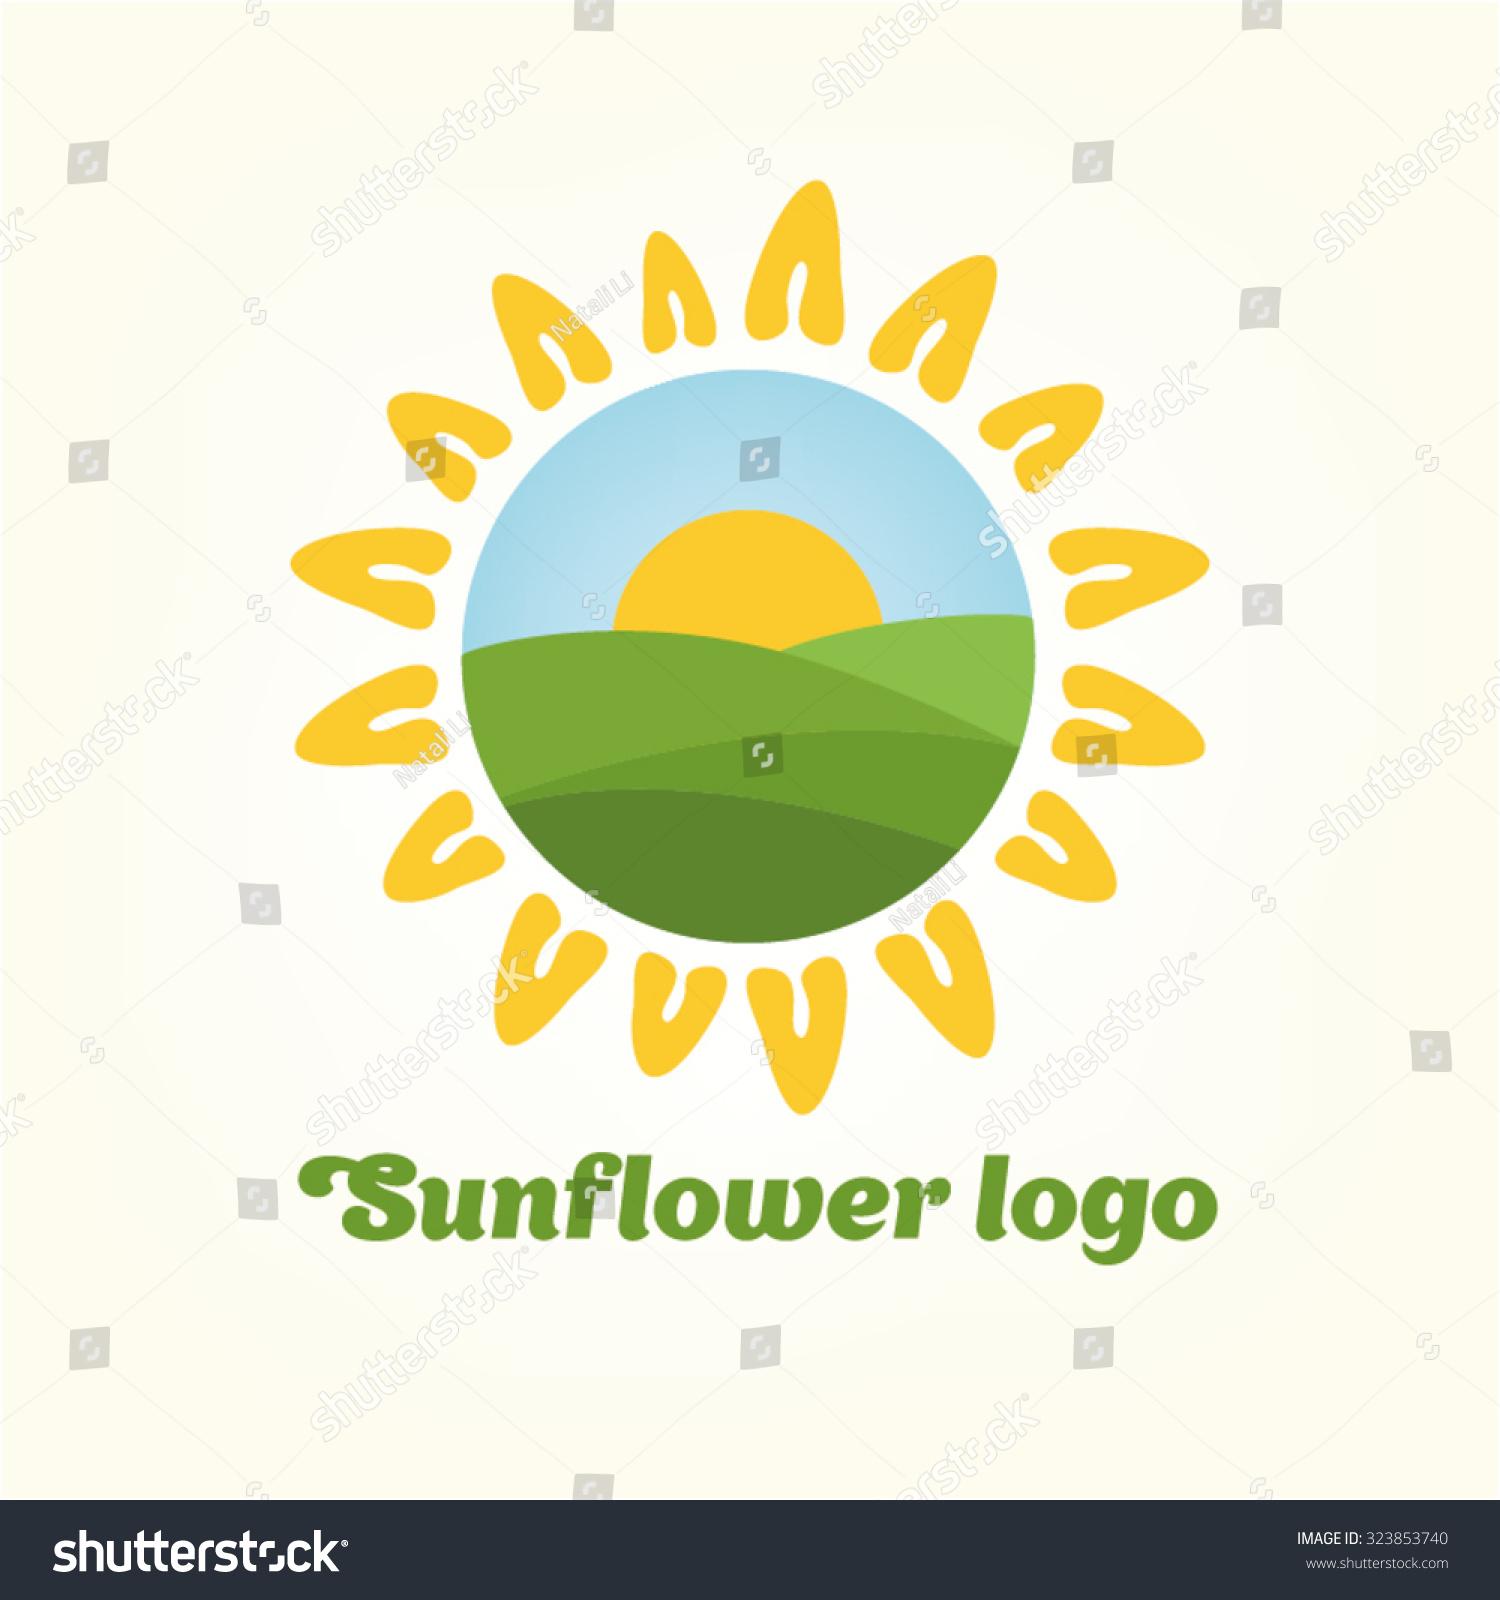 Royalty Free Logo Sunflower Yellowflower Sun Summer 323853740